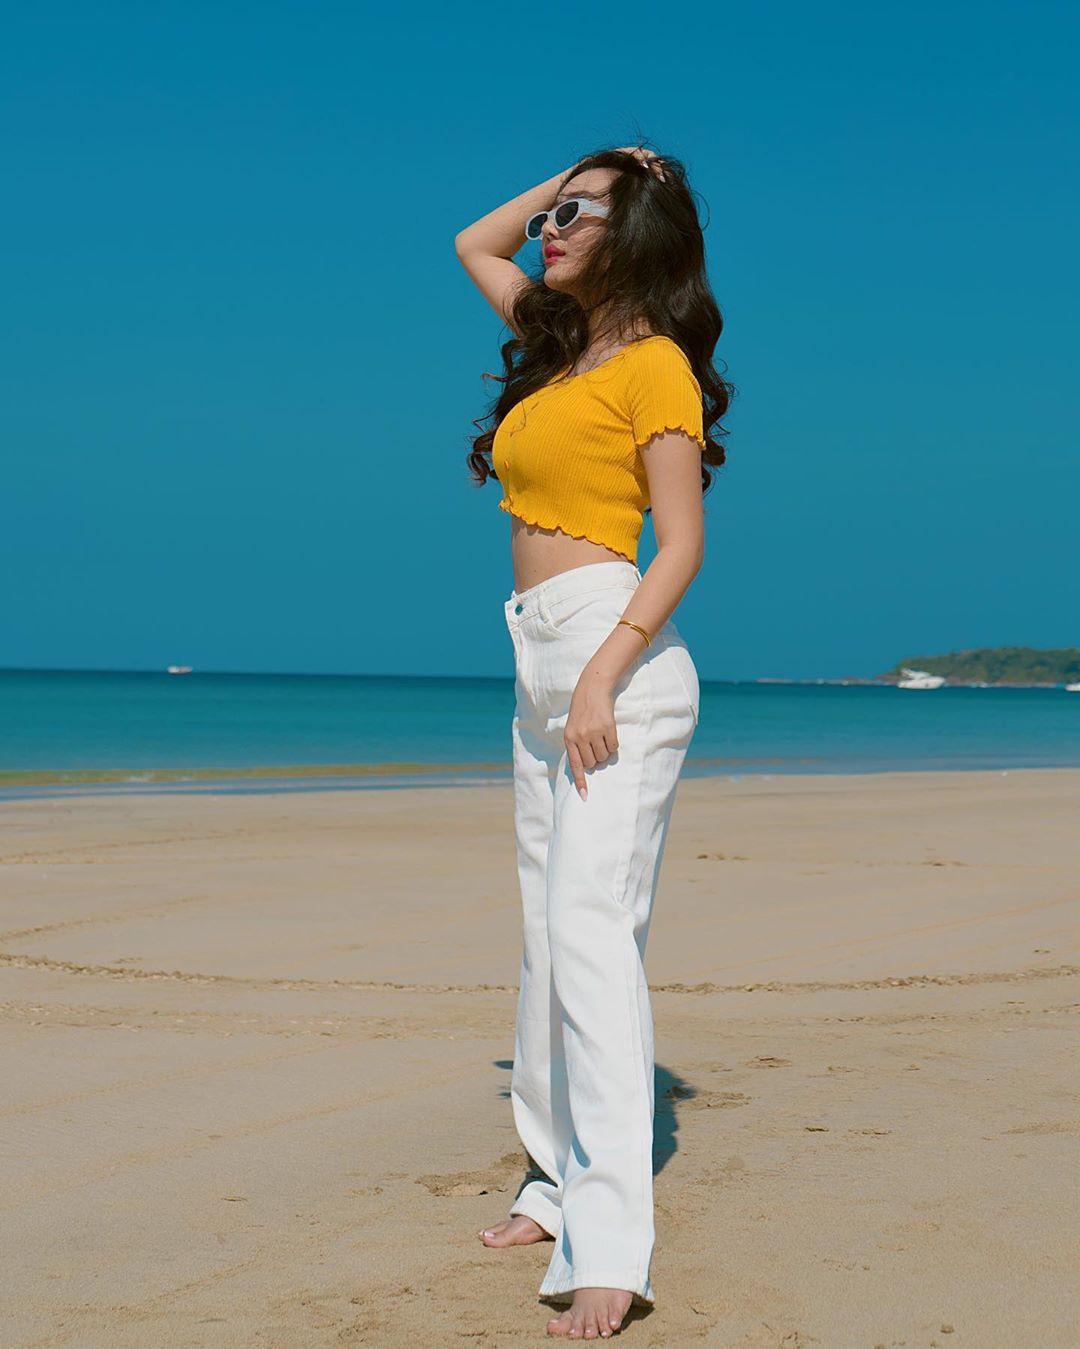 Hsu Eaint San hot girls photoshoot, costumes designs, photo shoot